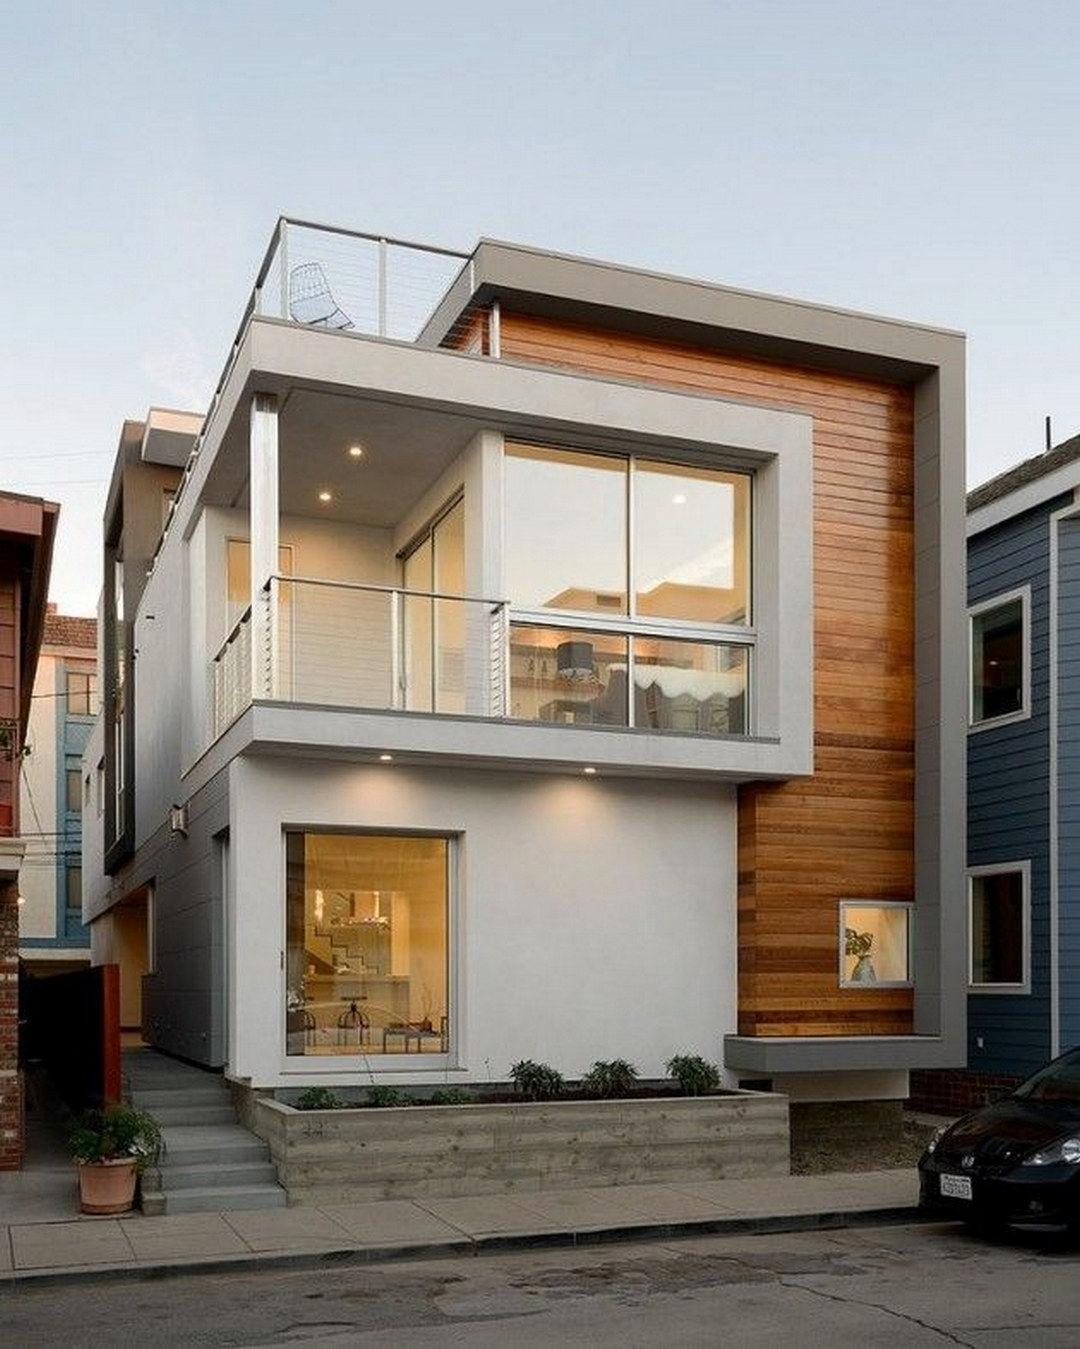 66 Incredible House Design Inspirations | Design inspiration ...